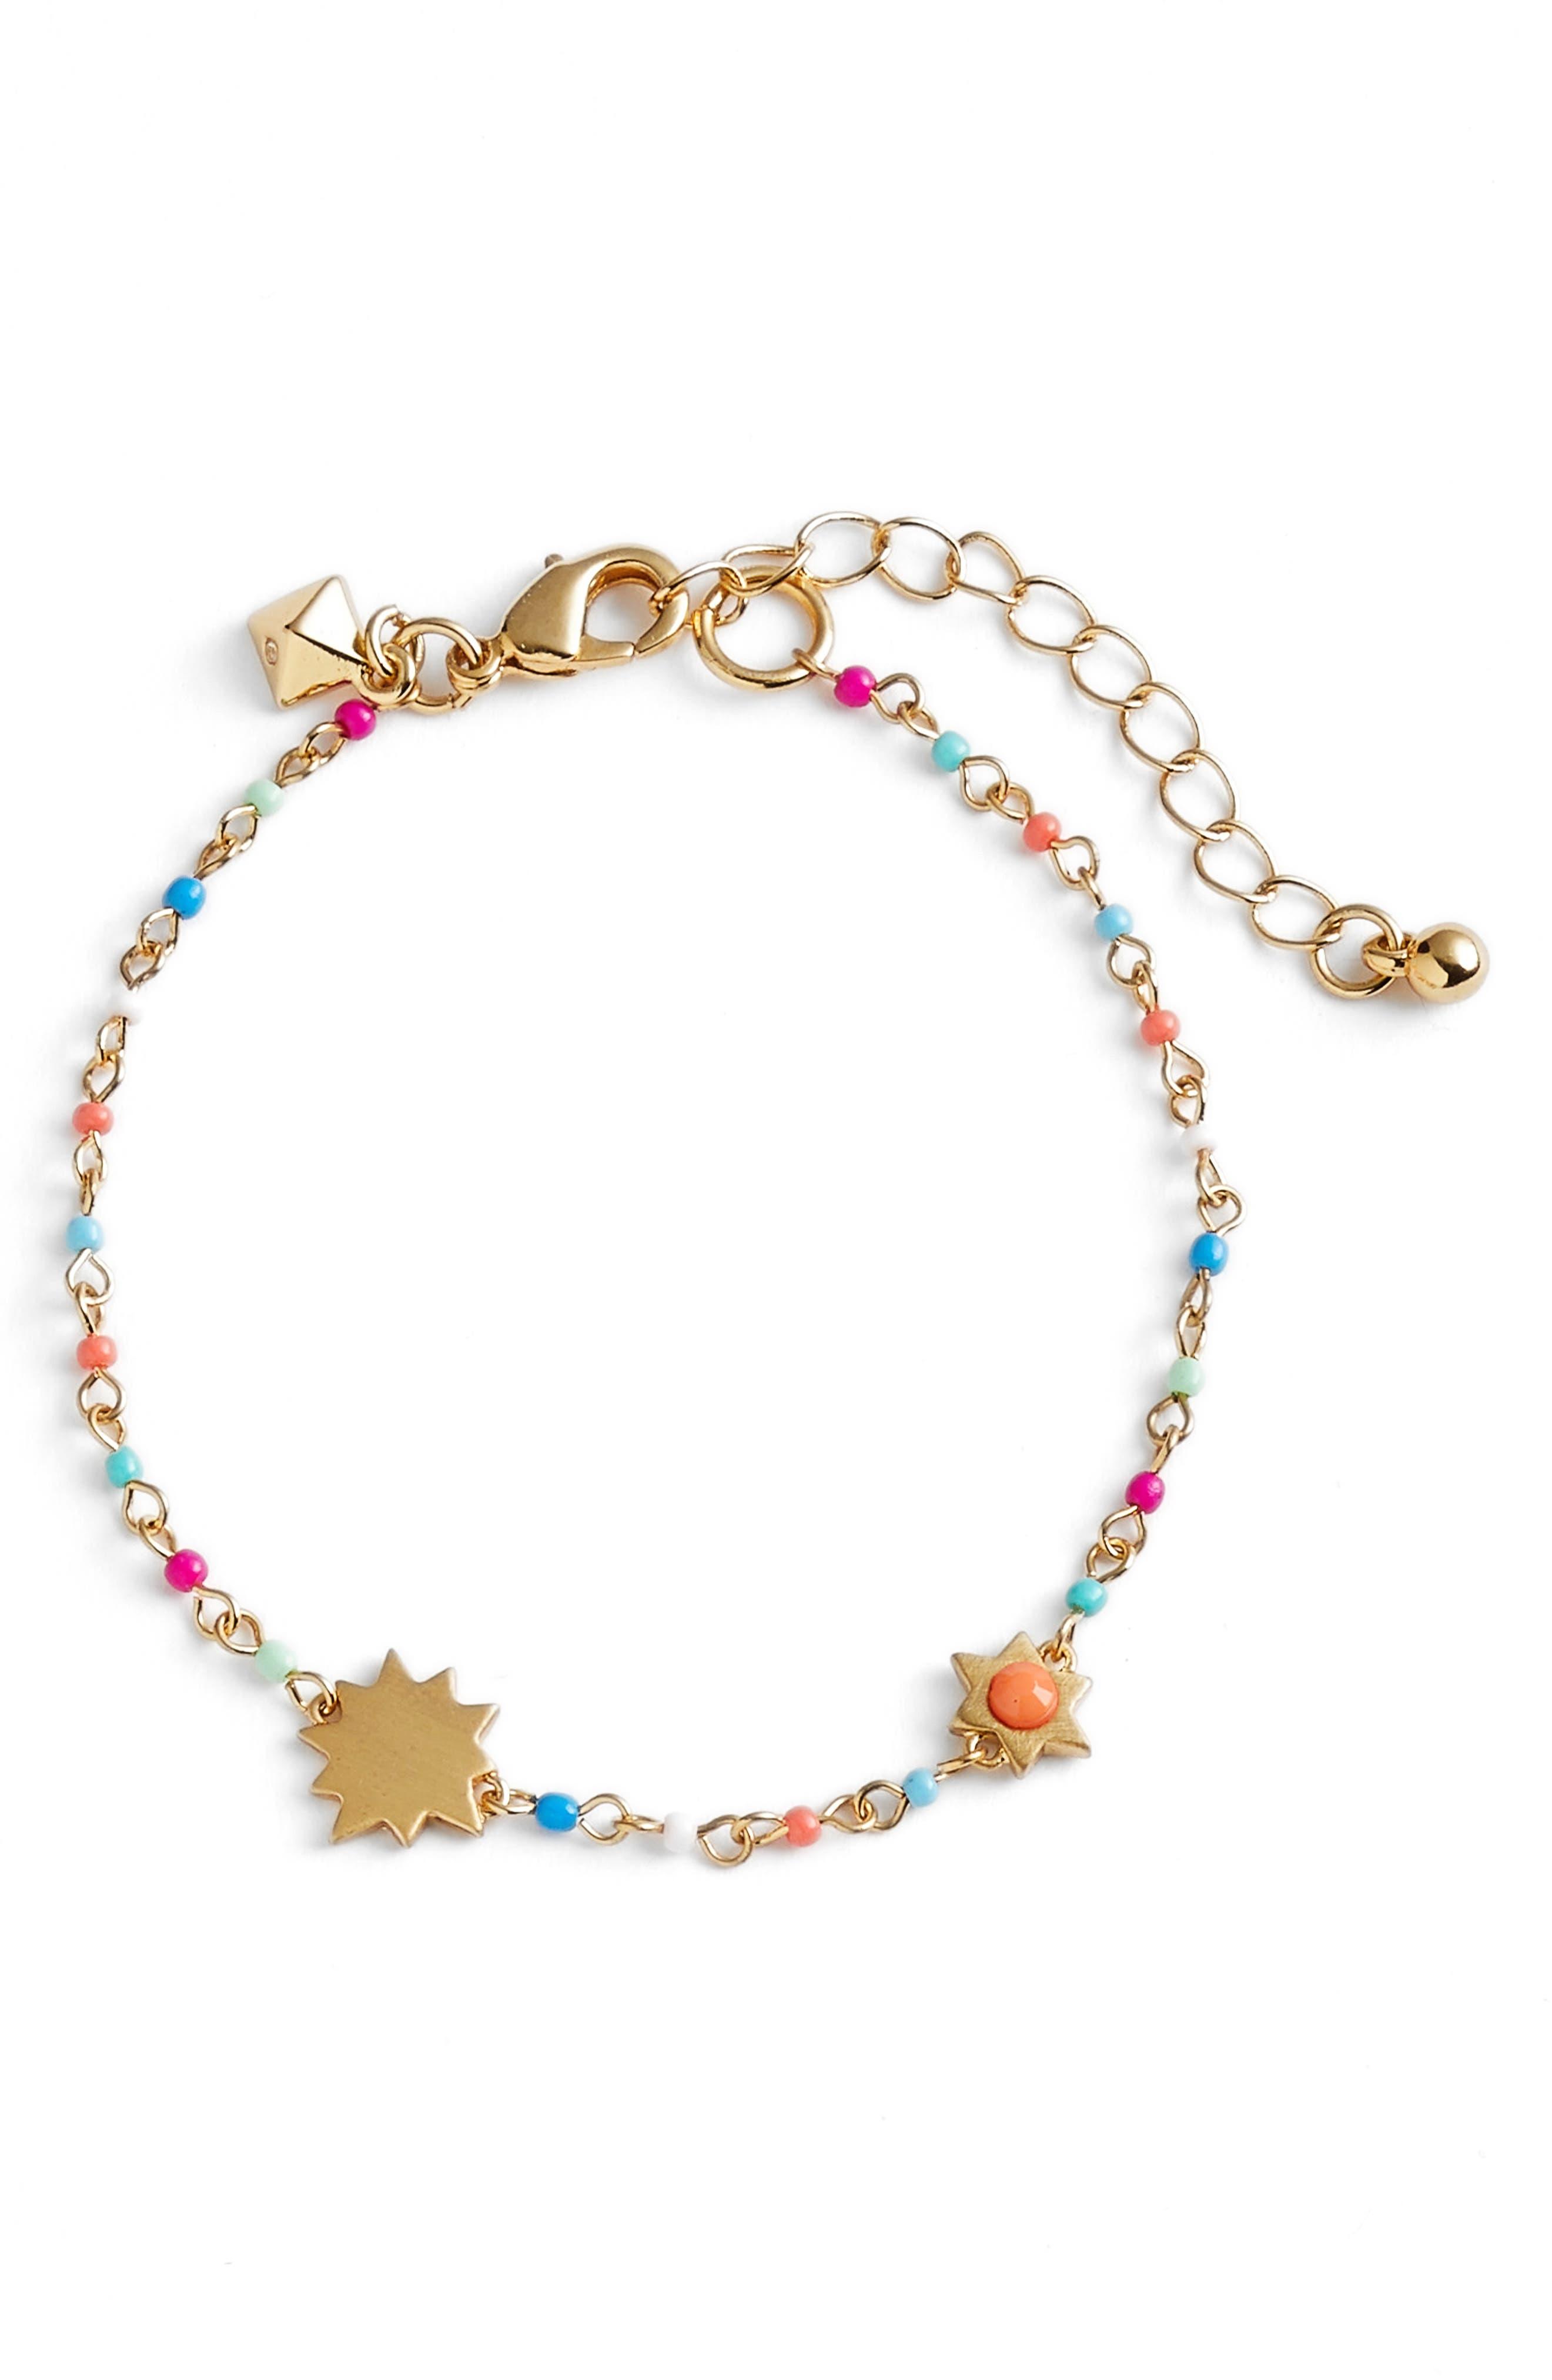 Sole Beaded Link Bracelet,                             Main thumbnail 1, color,                             Bright Multi/ Gold